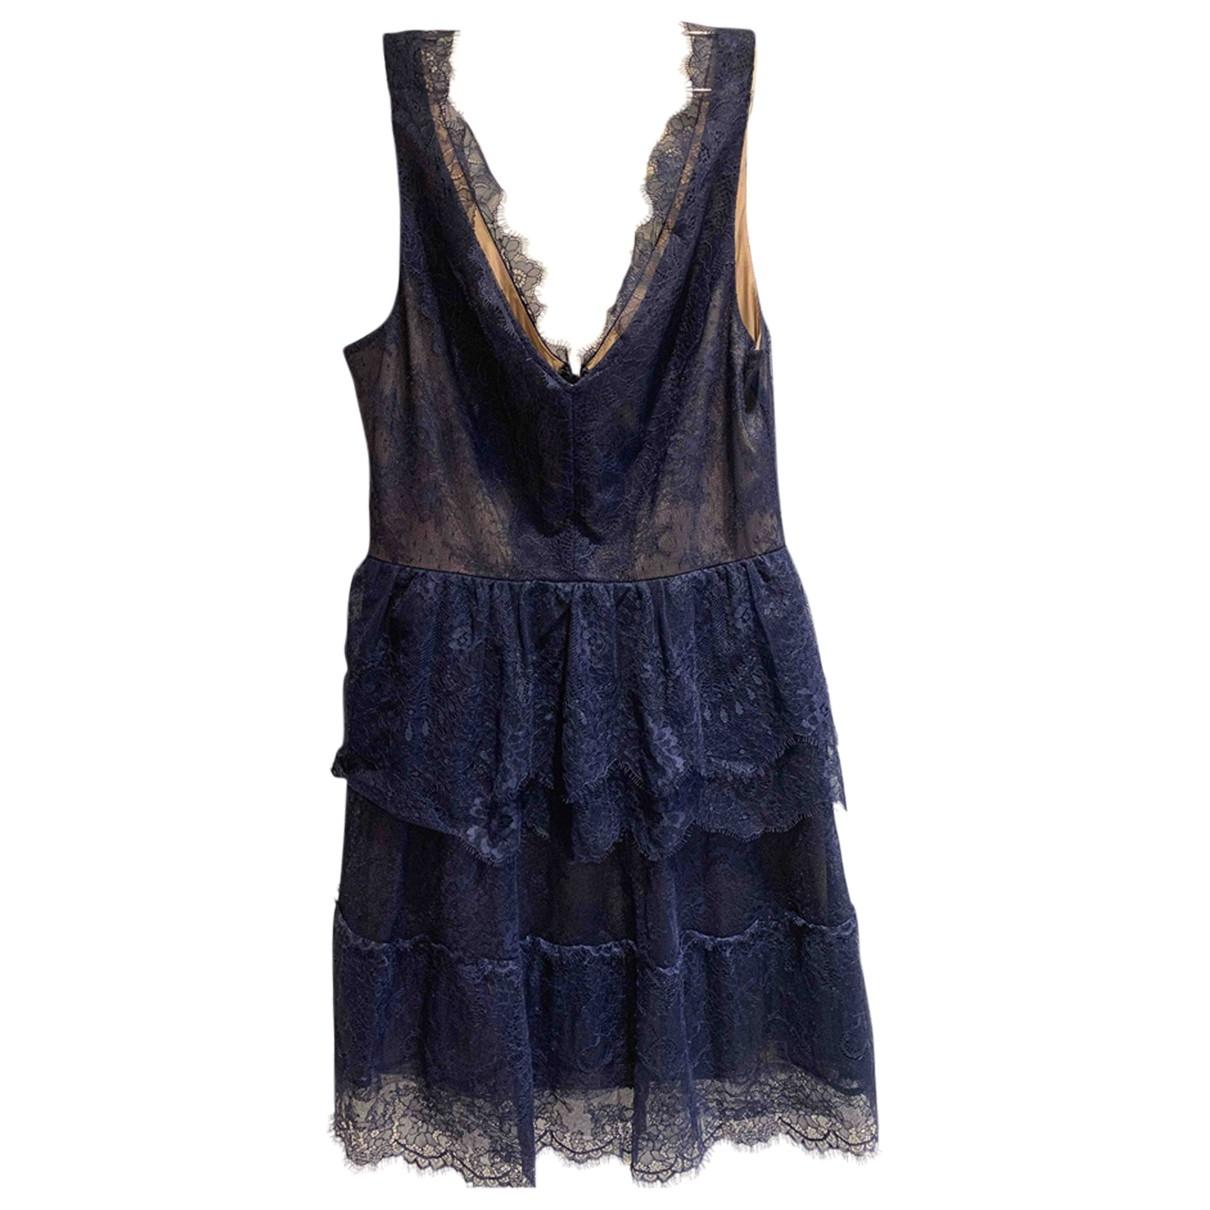 Bcbg Max Azria \N Navy dress for Women M International